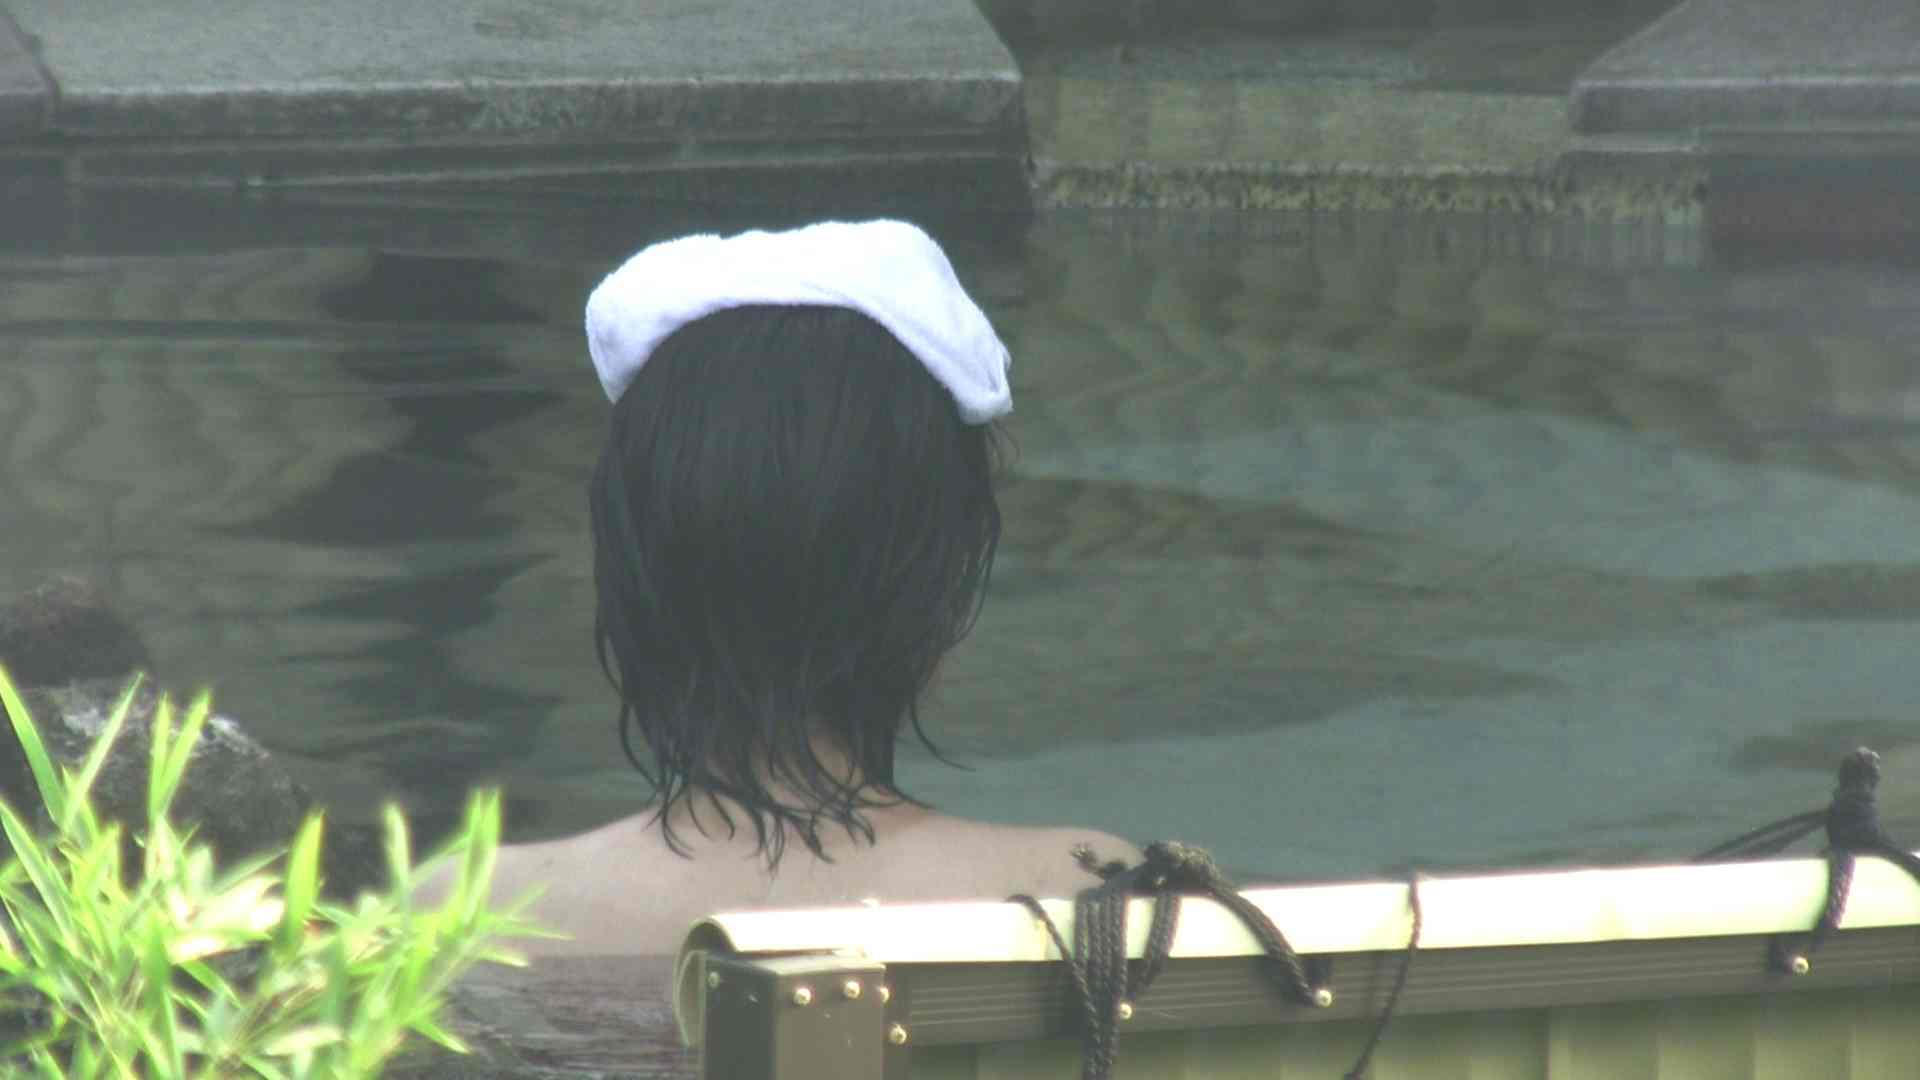 Aquaな露天風呂Vol.172 盗撮映像  113Pix 85